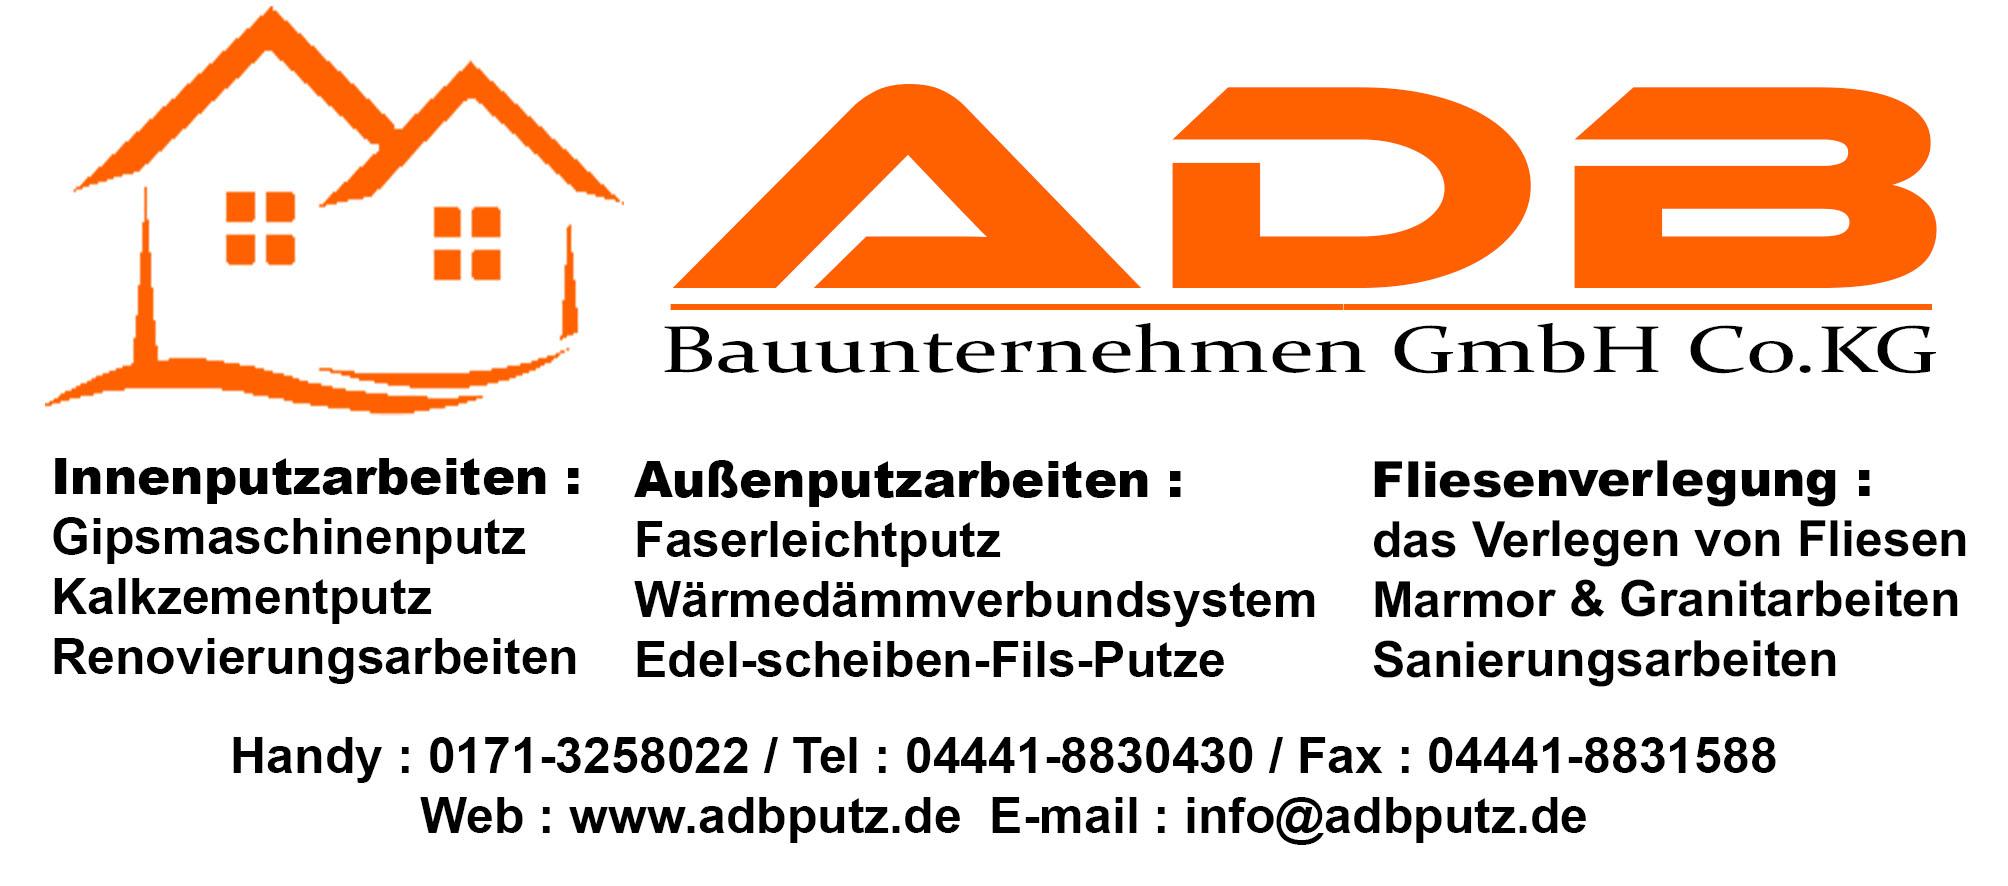 http://adb-putz.de/ADBEREJA.jpg